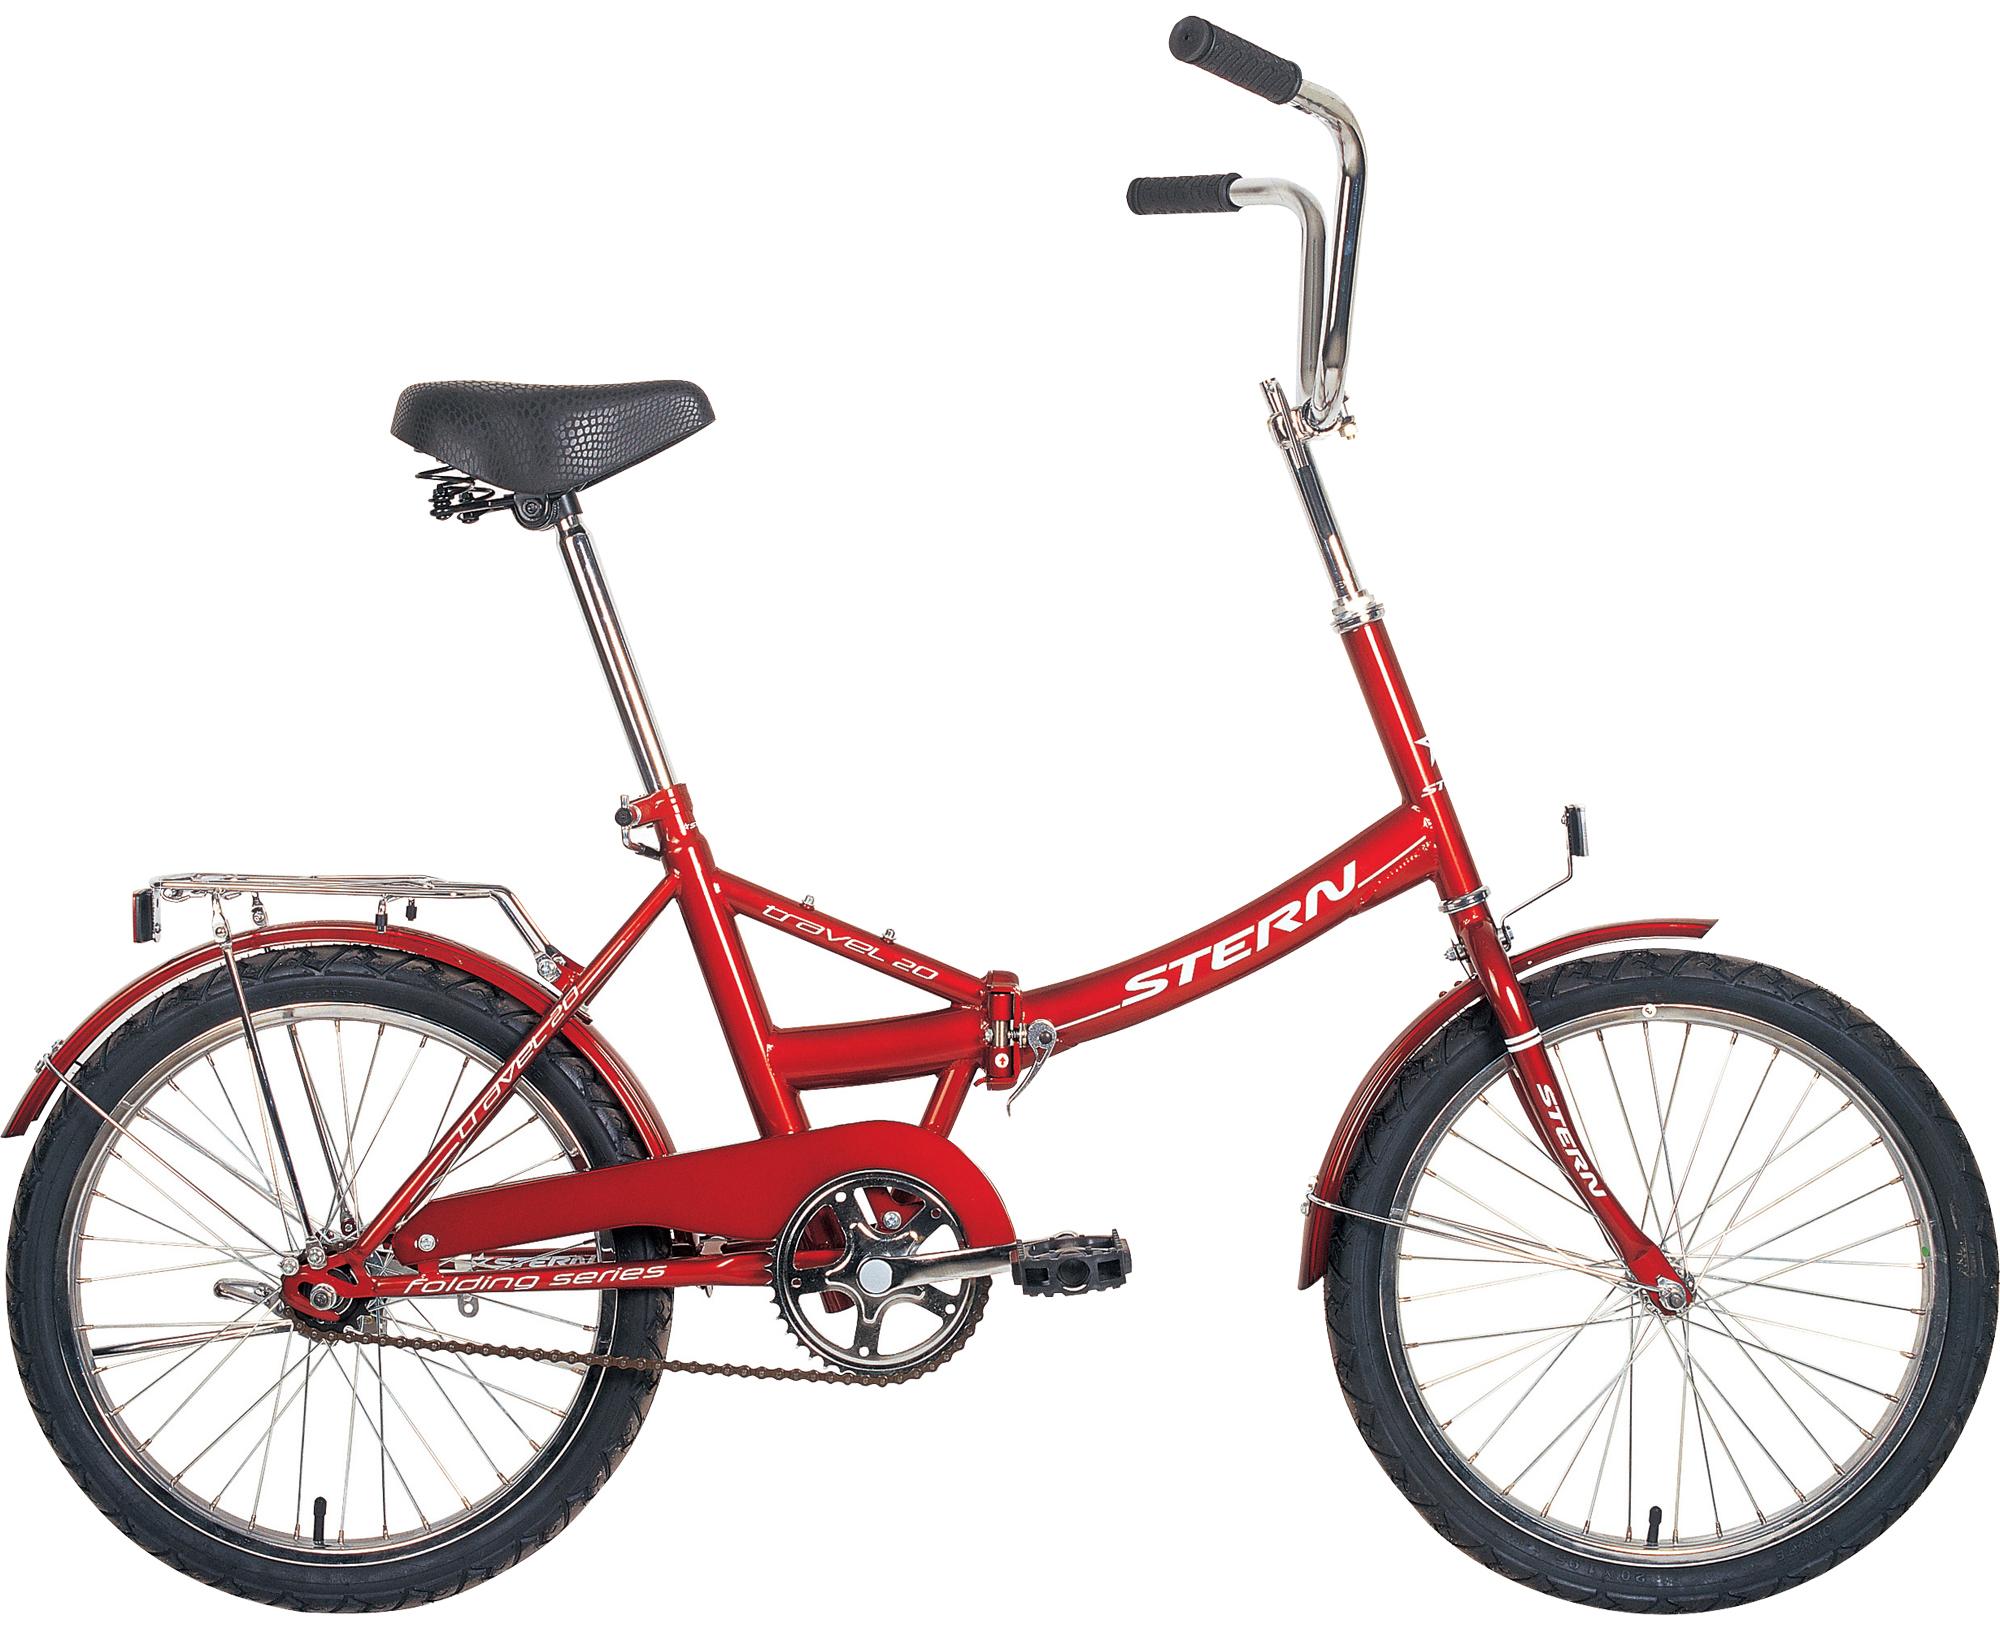 Stern Stern Travel 20 (2017) велосипед с колесами 20 mistigirl 320 дет